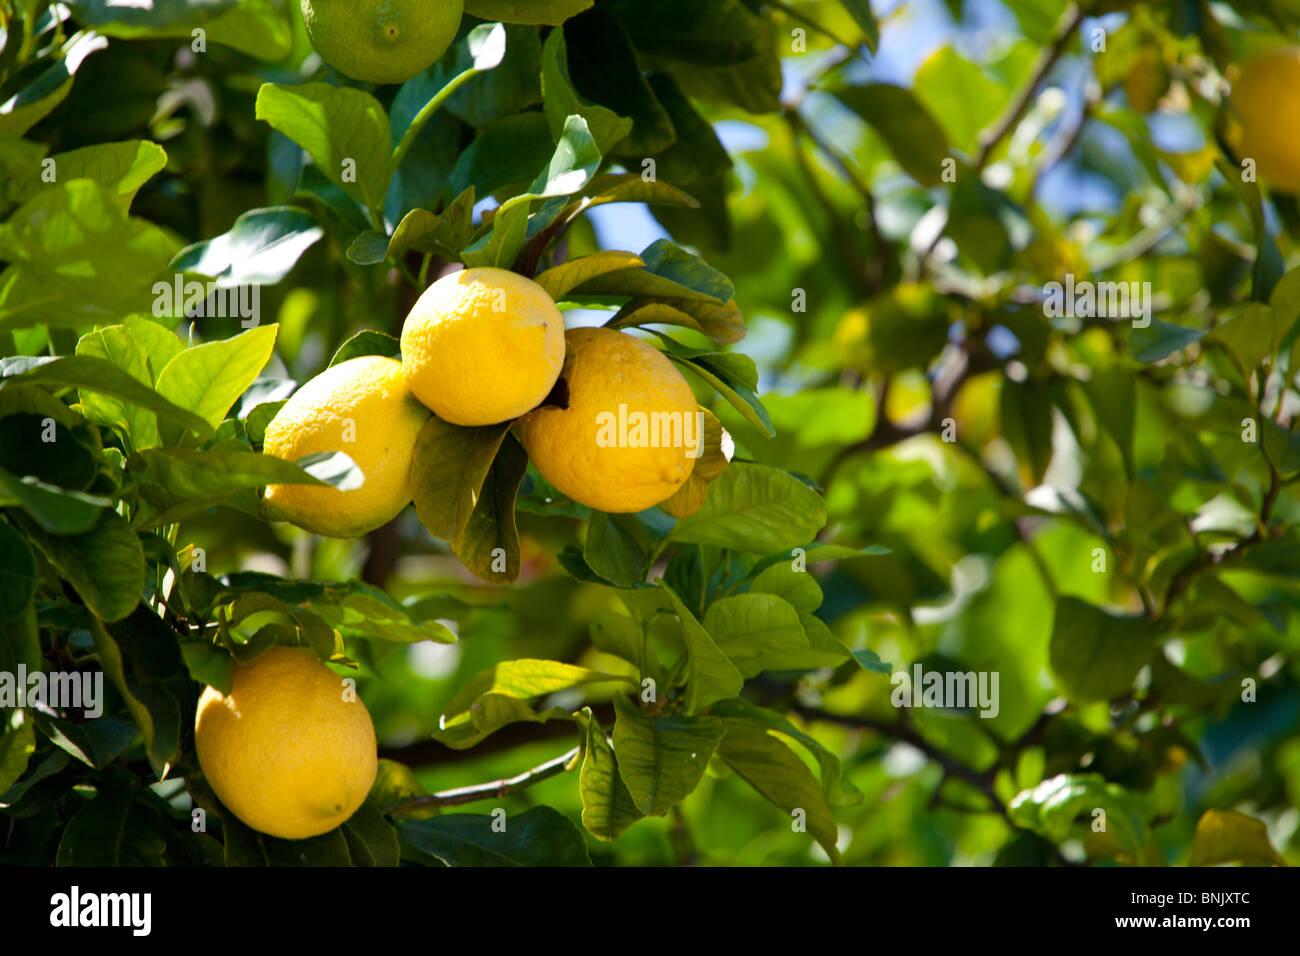 very-ripe-lemons-growing-on-a-lemon-tree